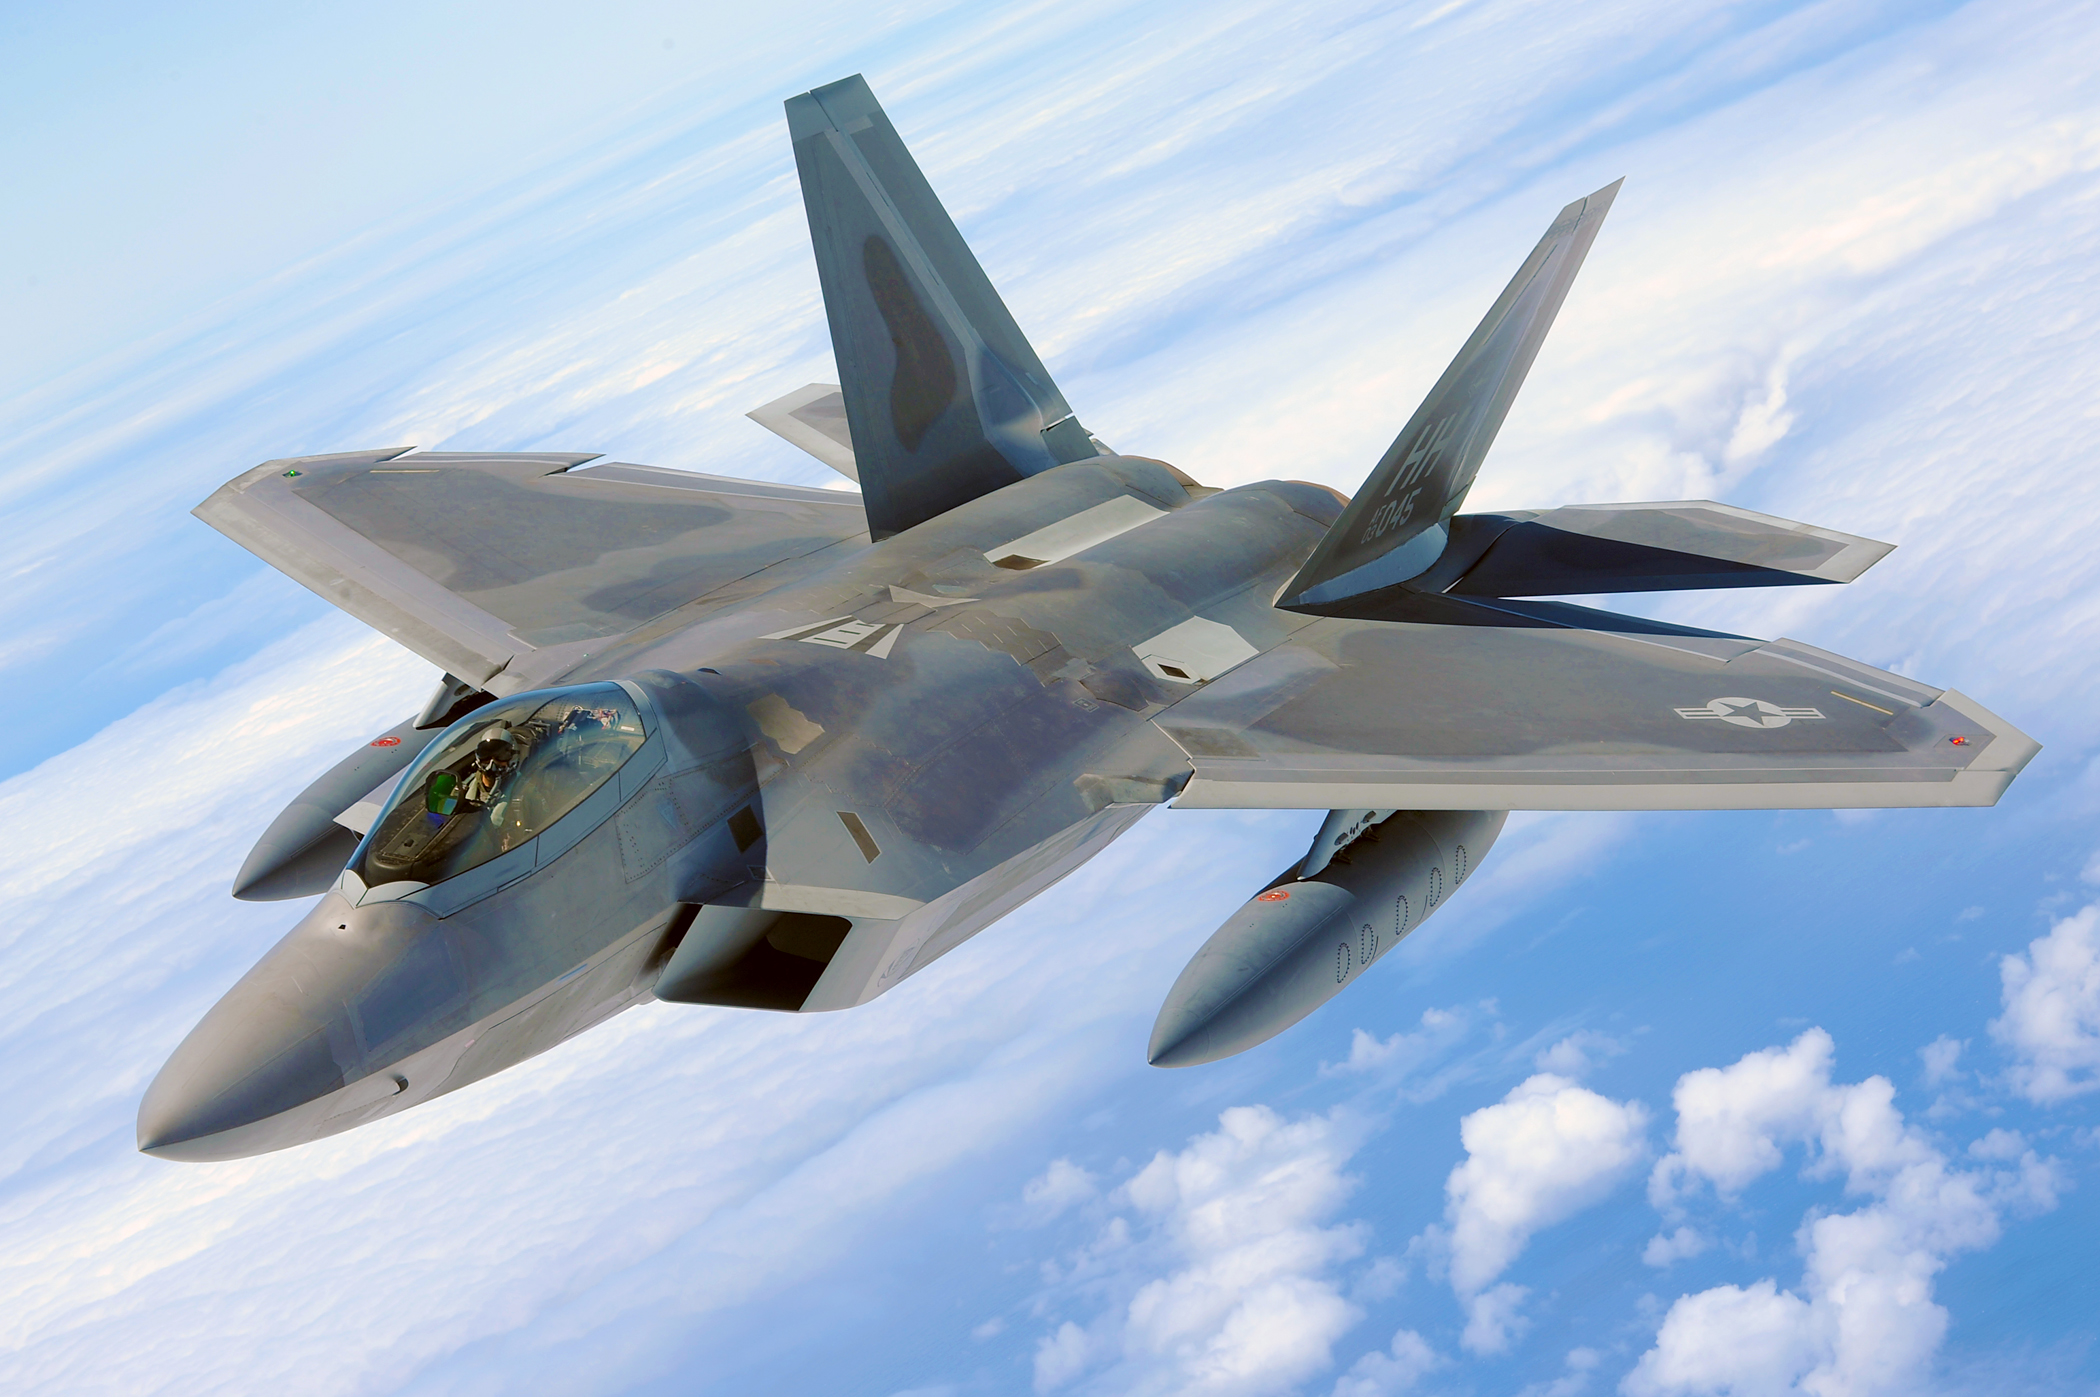 F-22 Raptor [Reto contra KB] F-22_raptor_-_100702-f-4815g-2171